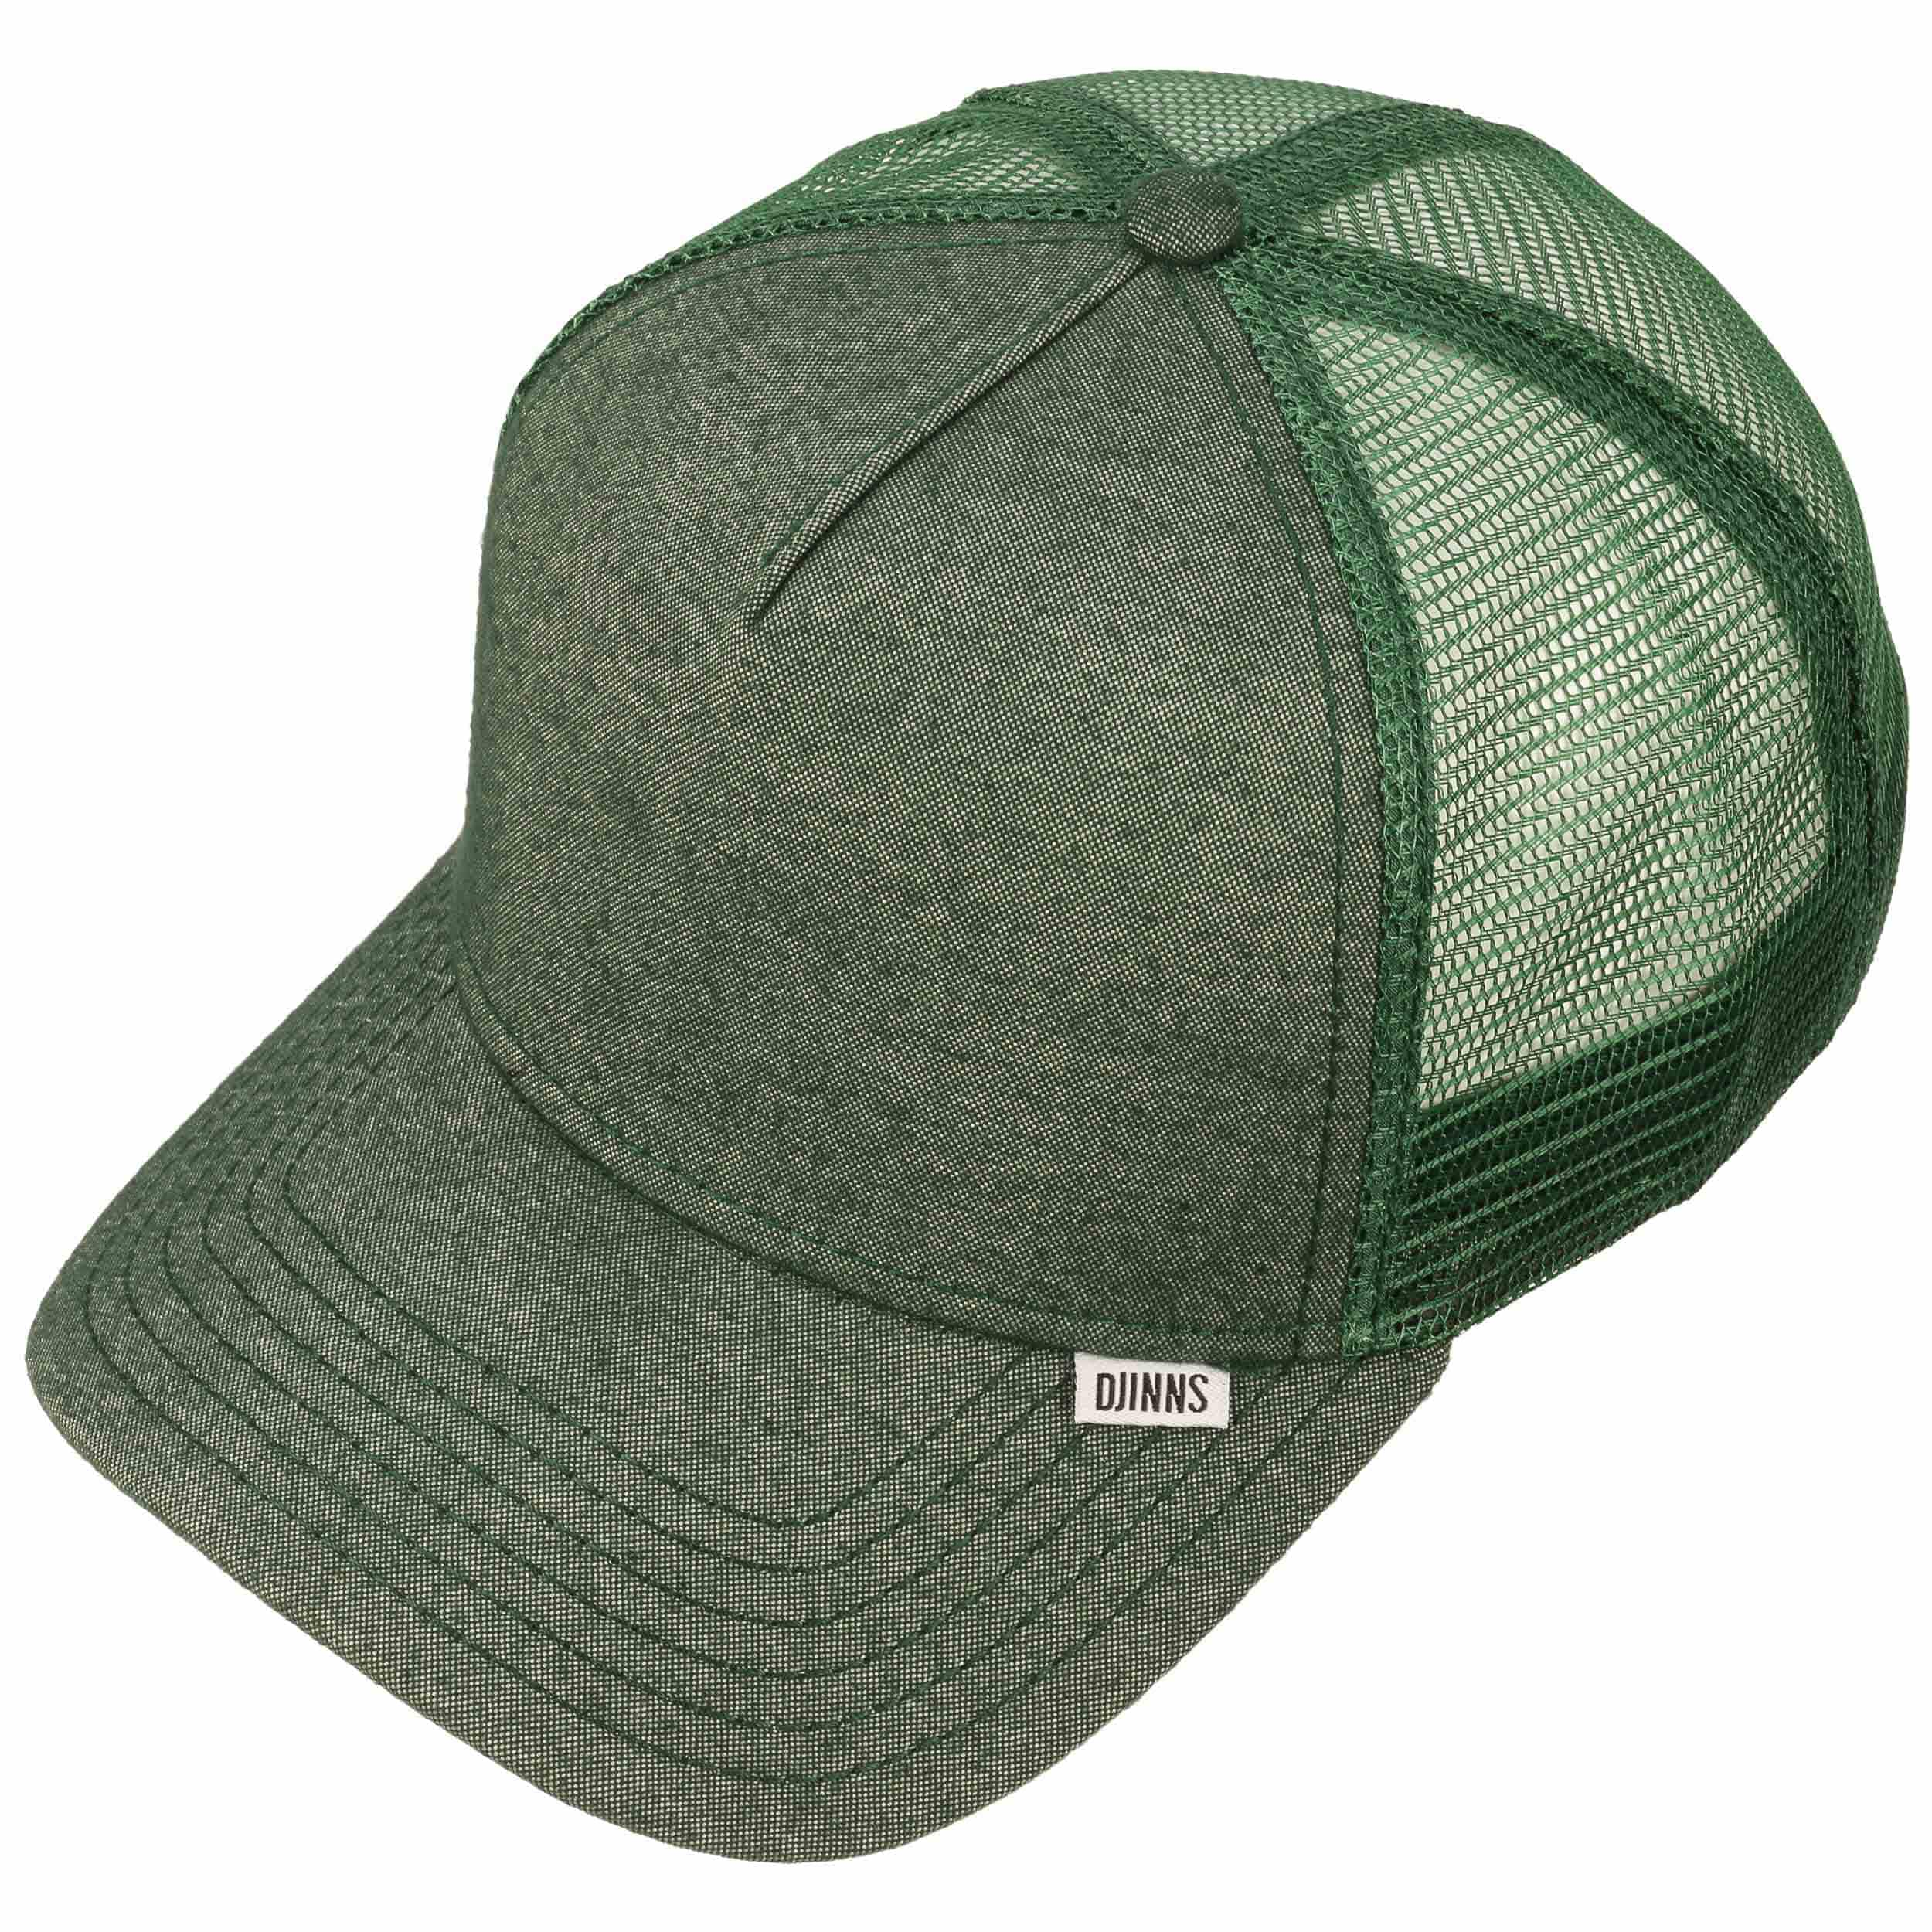 hft forever trucker cap by djinns eur 24 99 hats. Black Bedroom Furniture Sets. Home Design Ideas